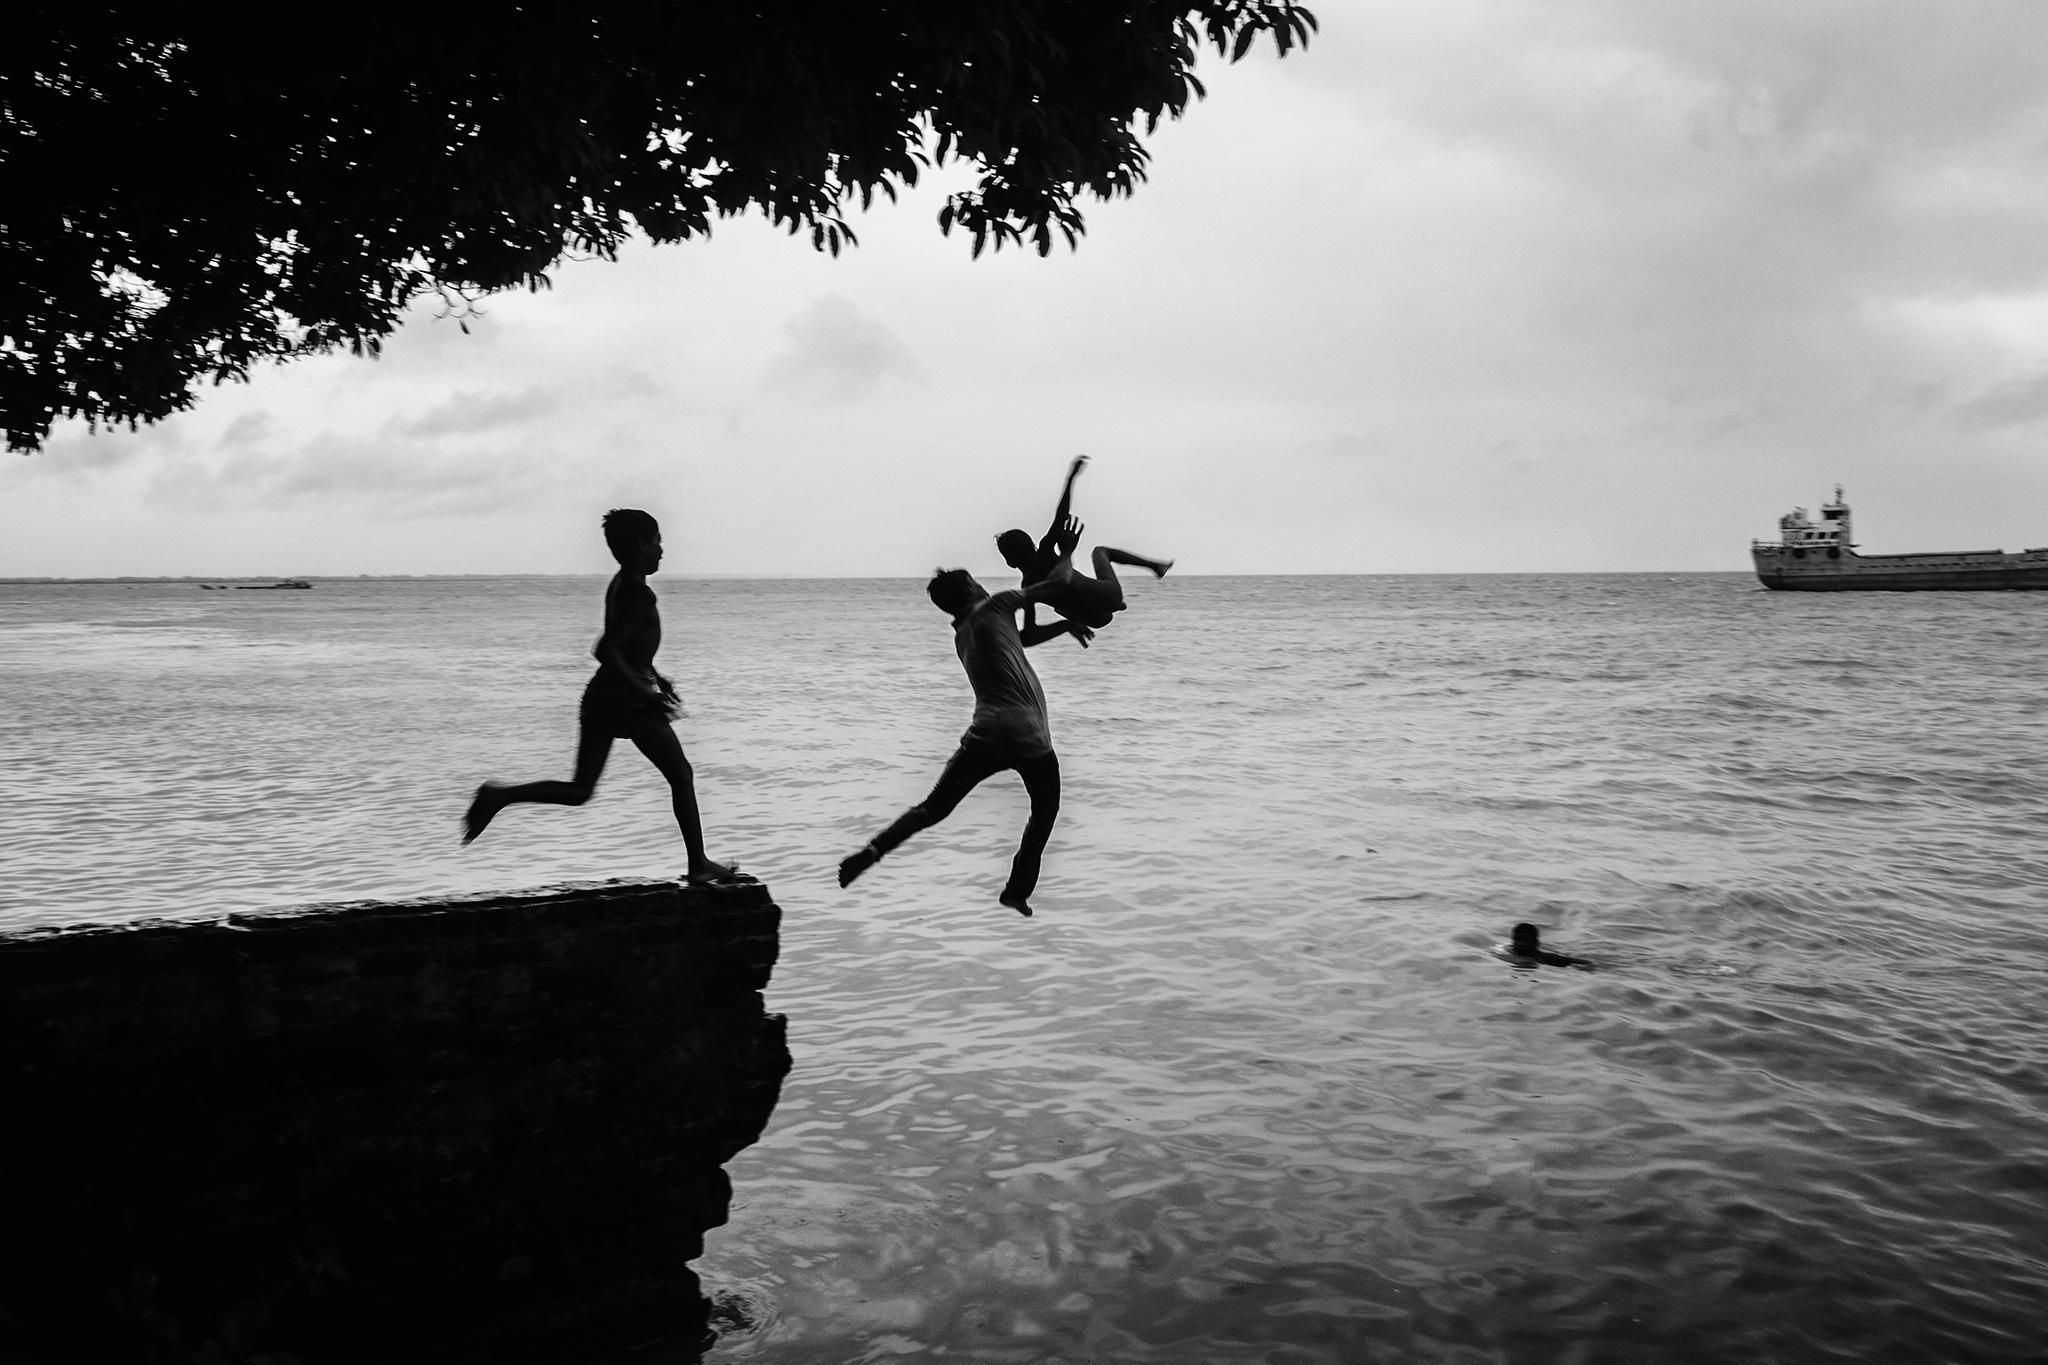 Having Fun by SaiMon HosSain